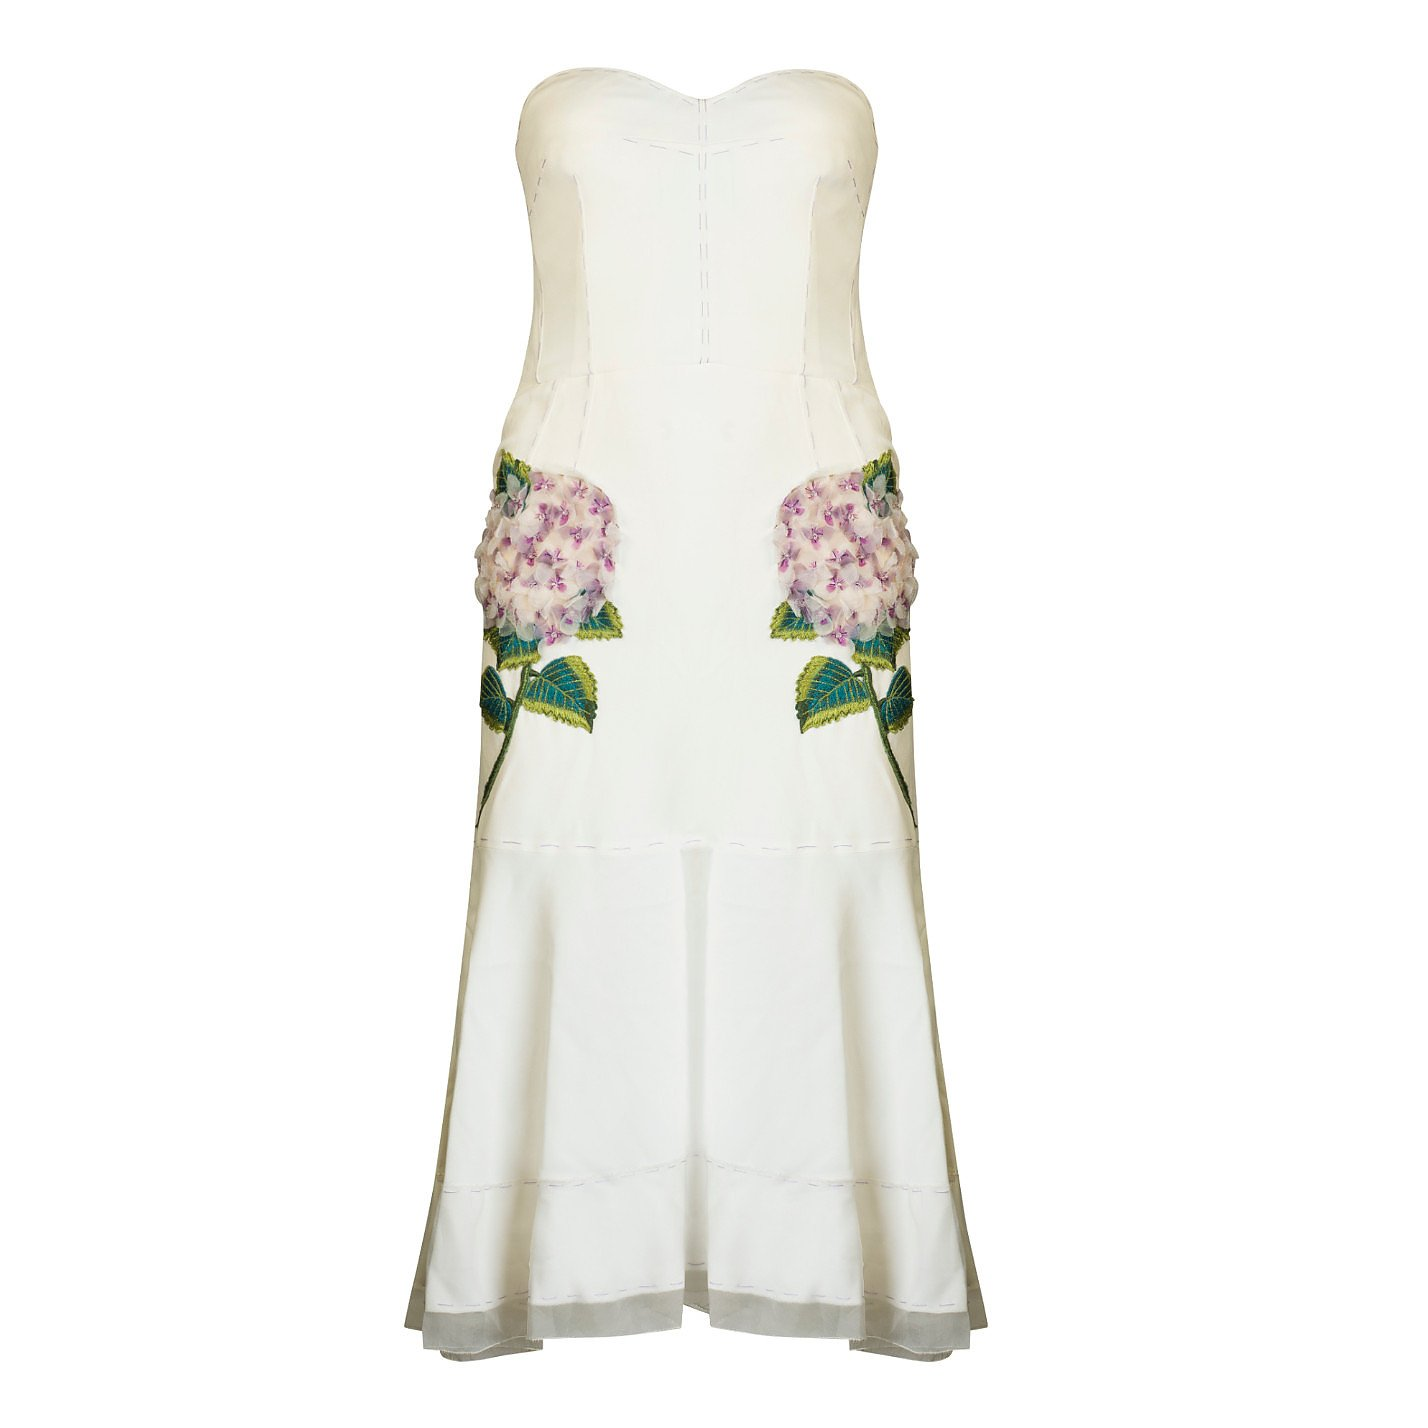 DOLCE & GABBANA Strapless Hydrangea Midi Dress